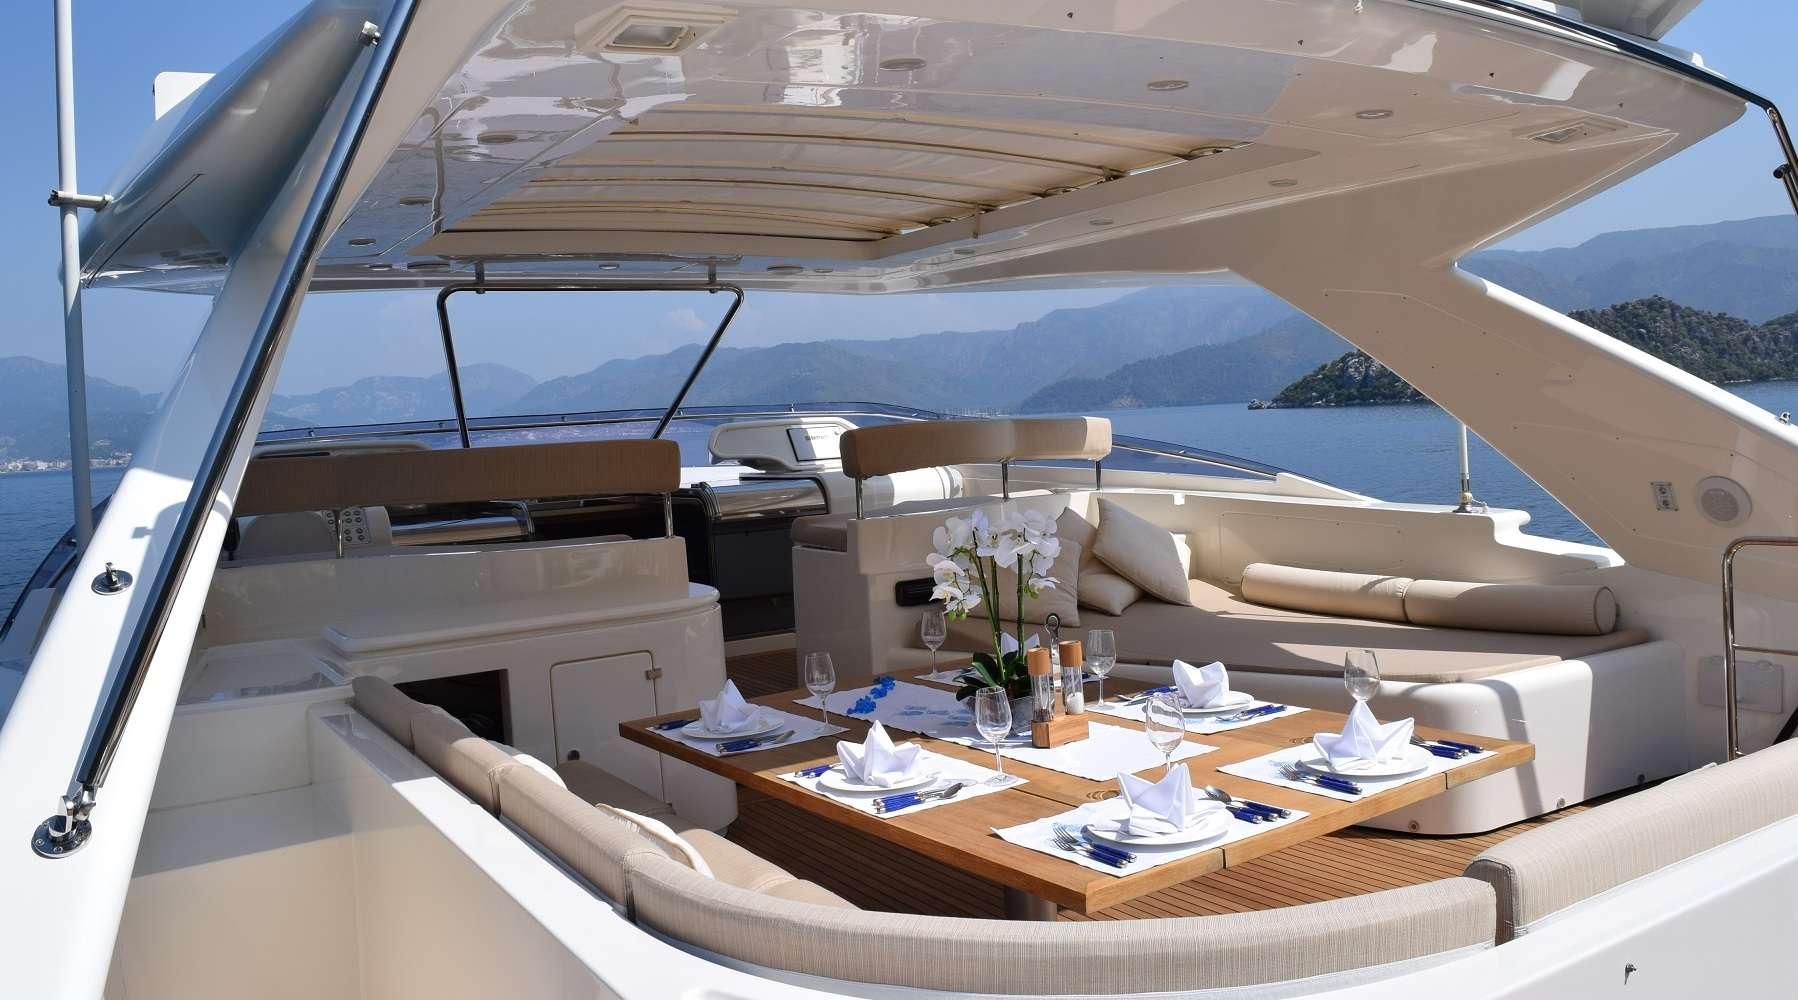 SEA LION II yacht image # 4